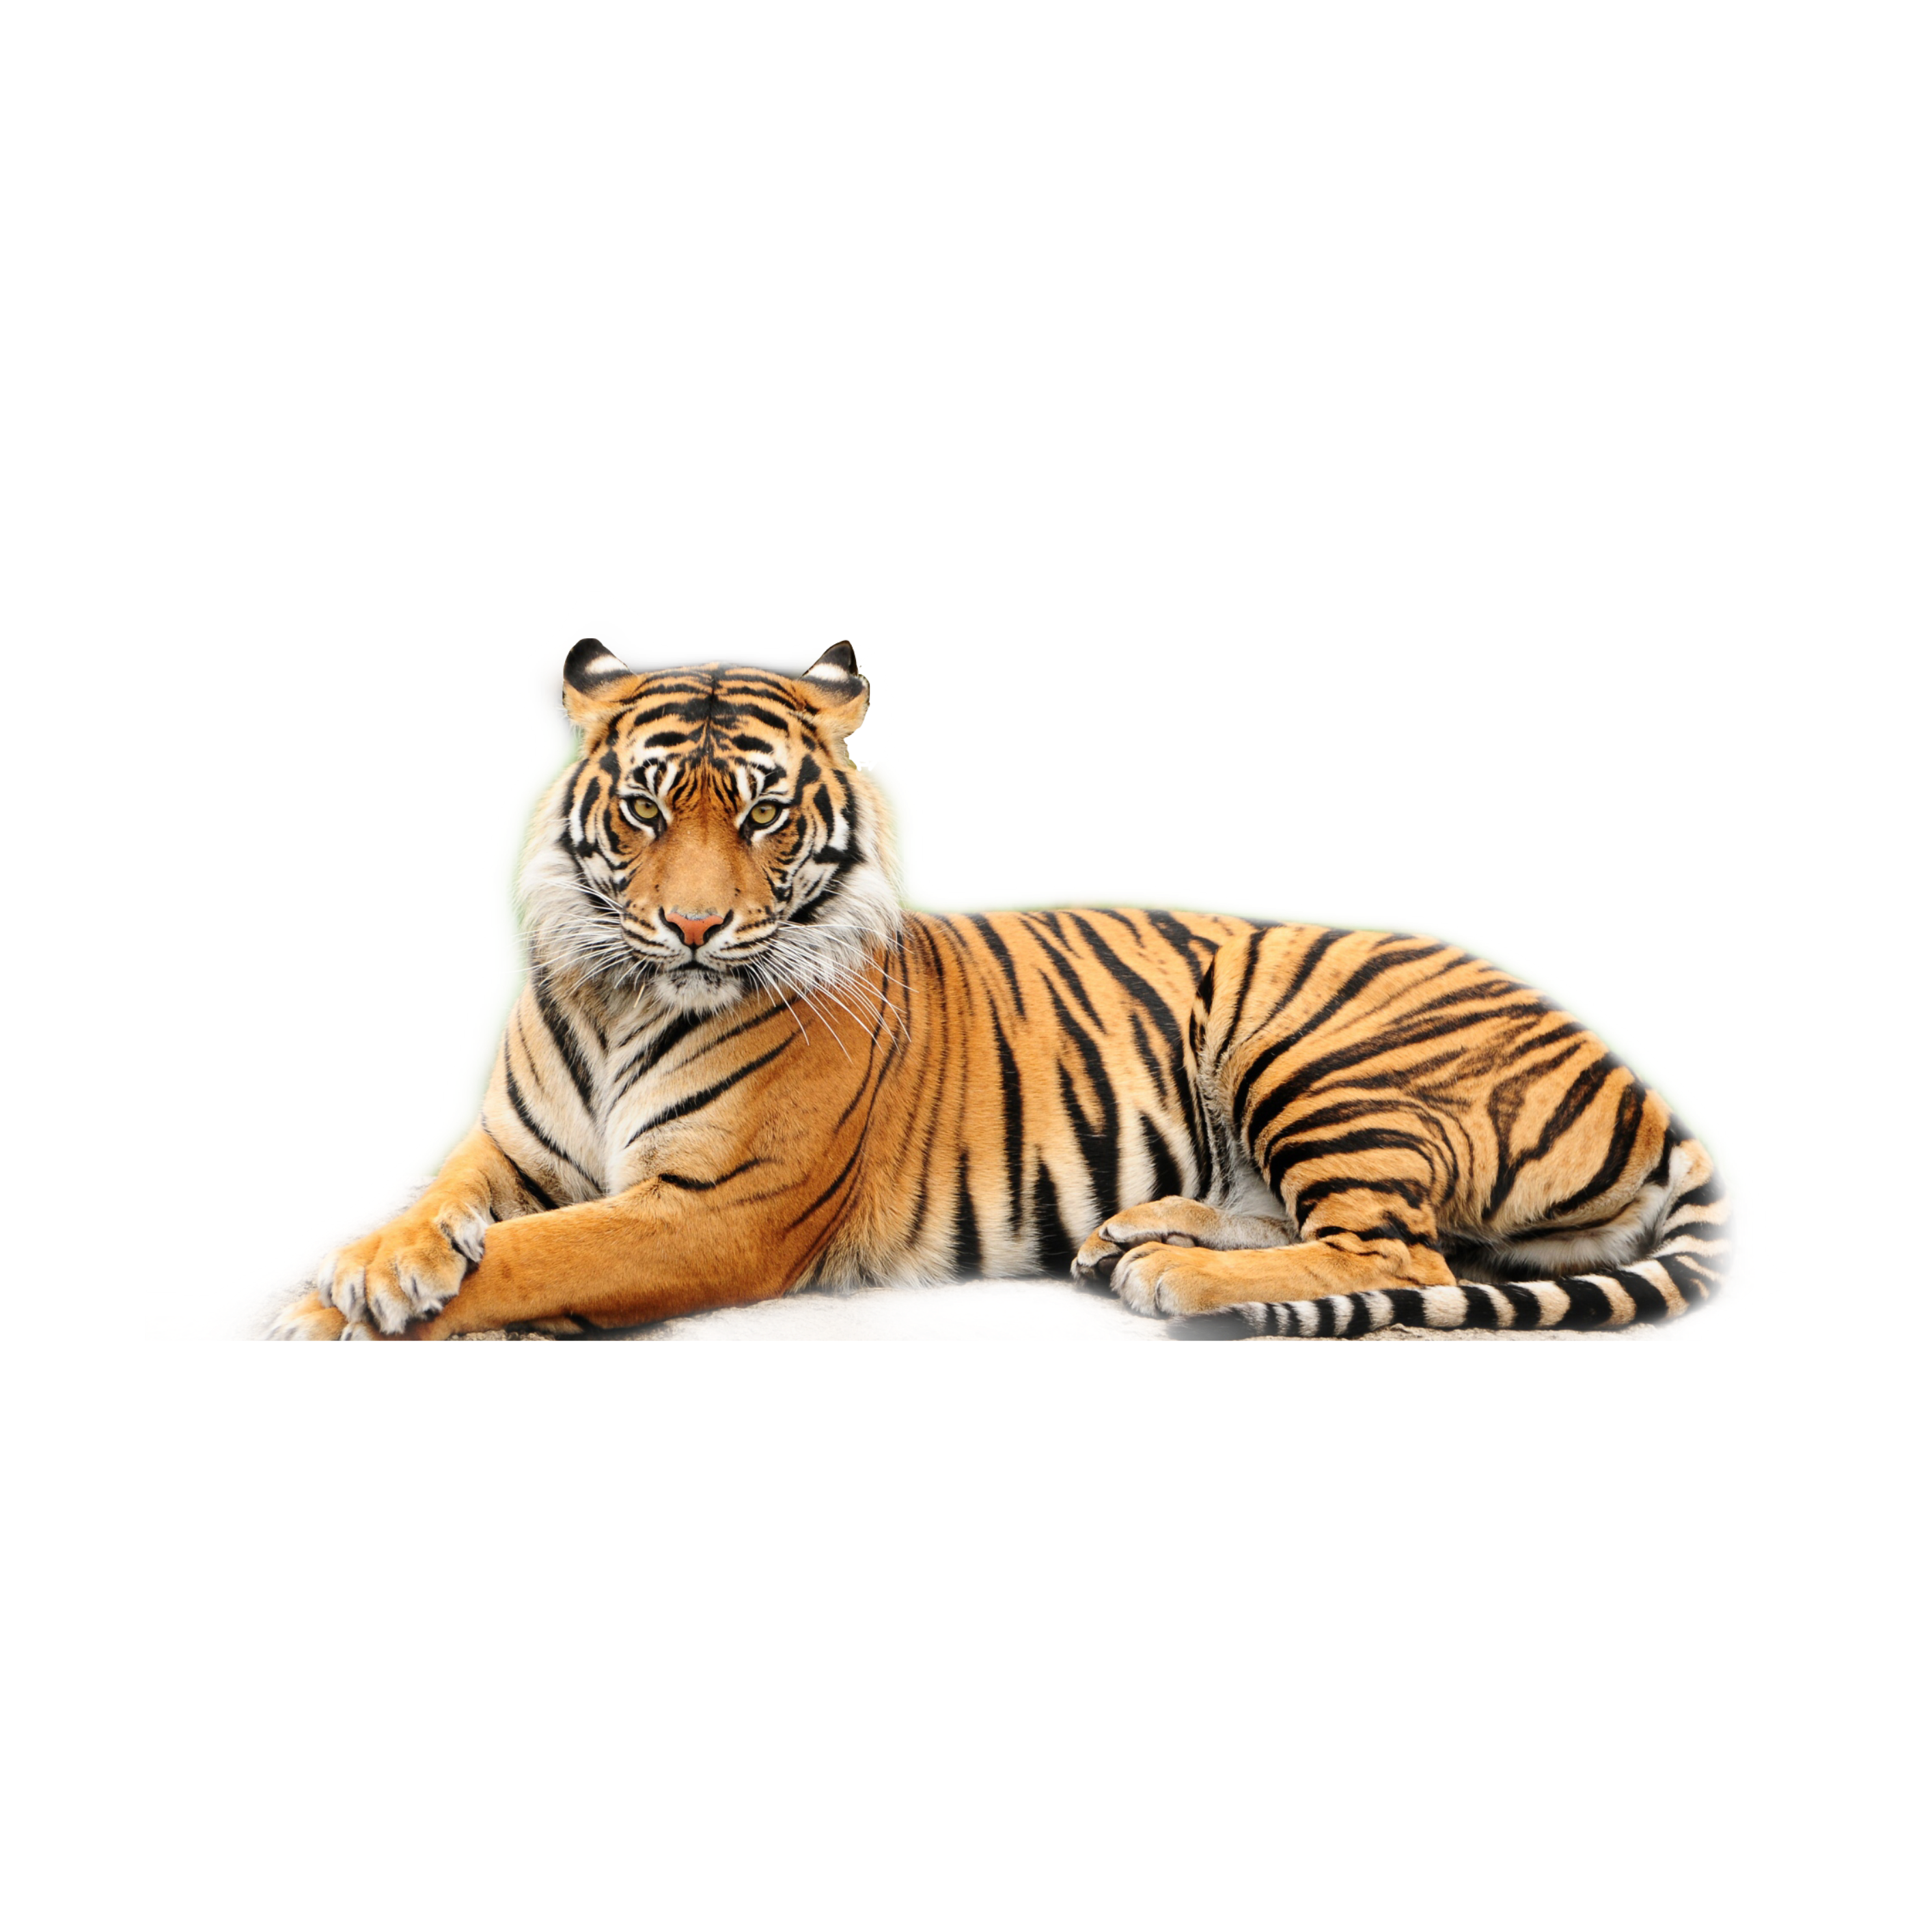 картинка тигр без фона серебра